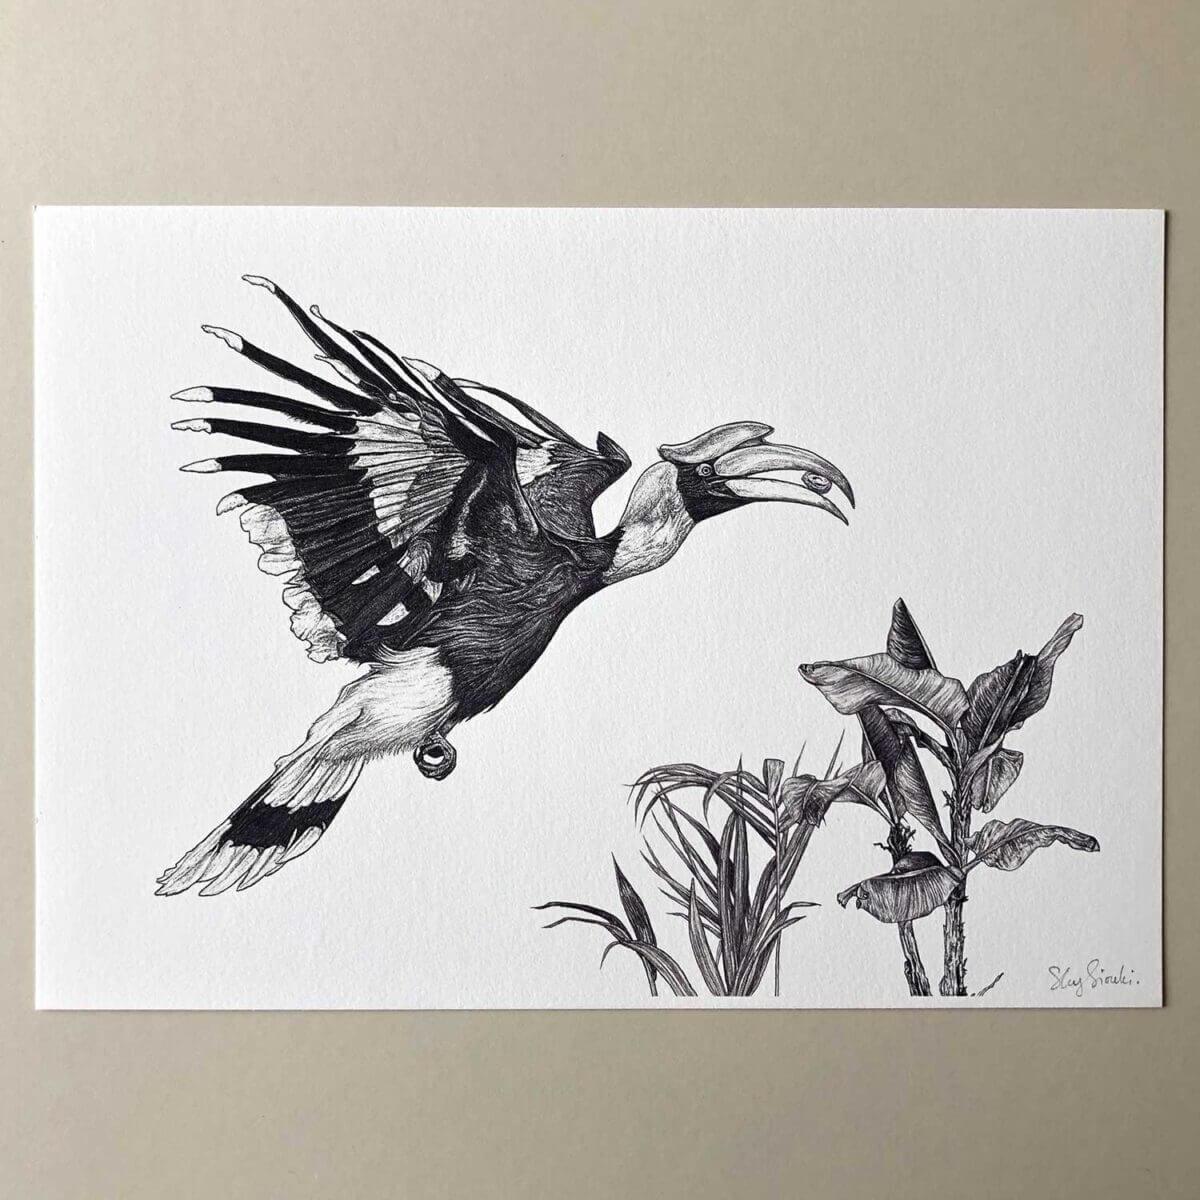 Great-Hornbill-Print-Flat-Sky-Siouki